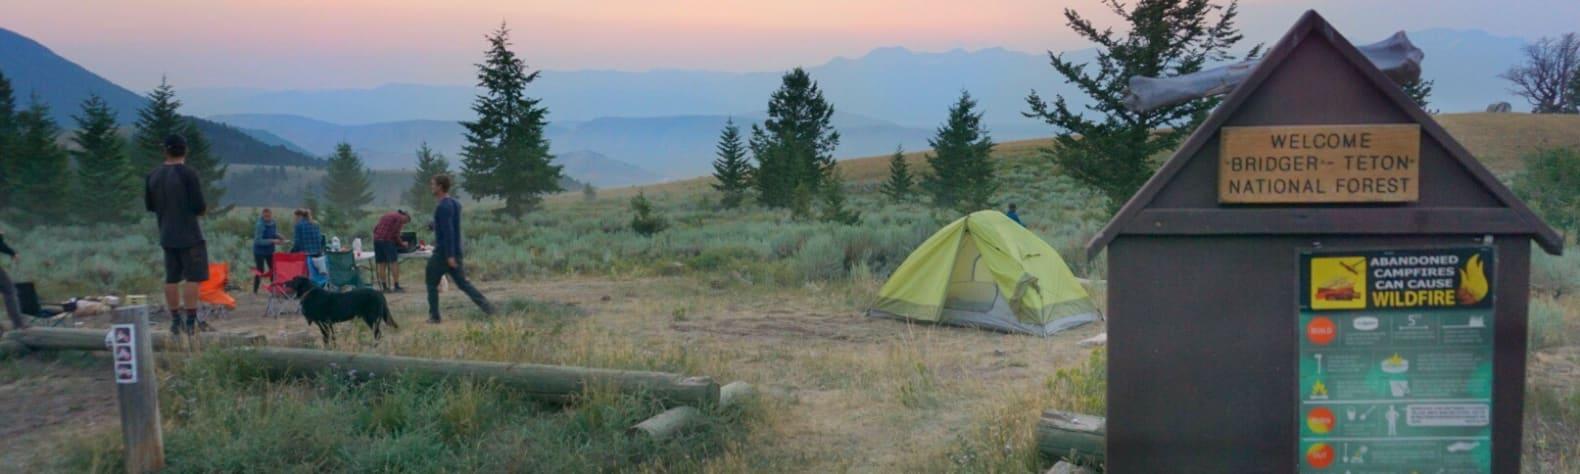 Teton National Forest